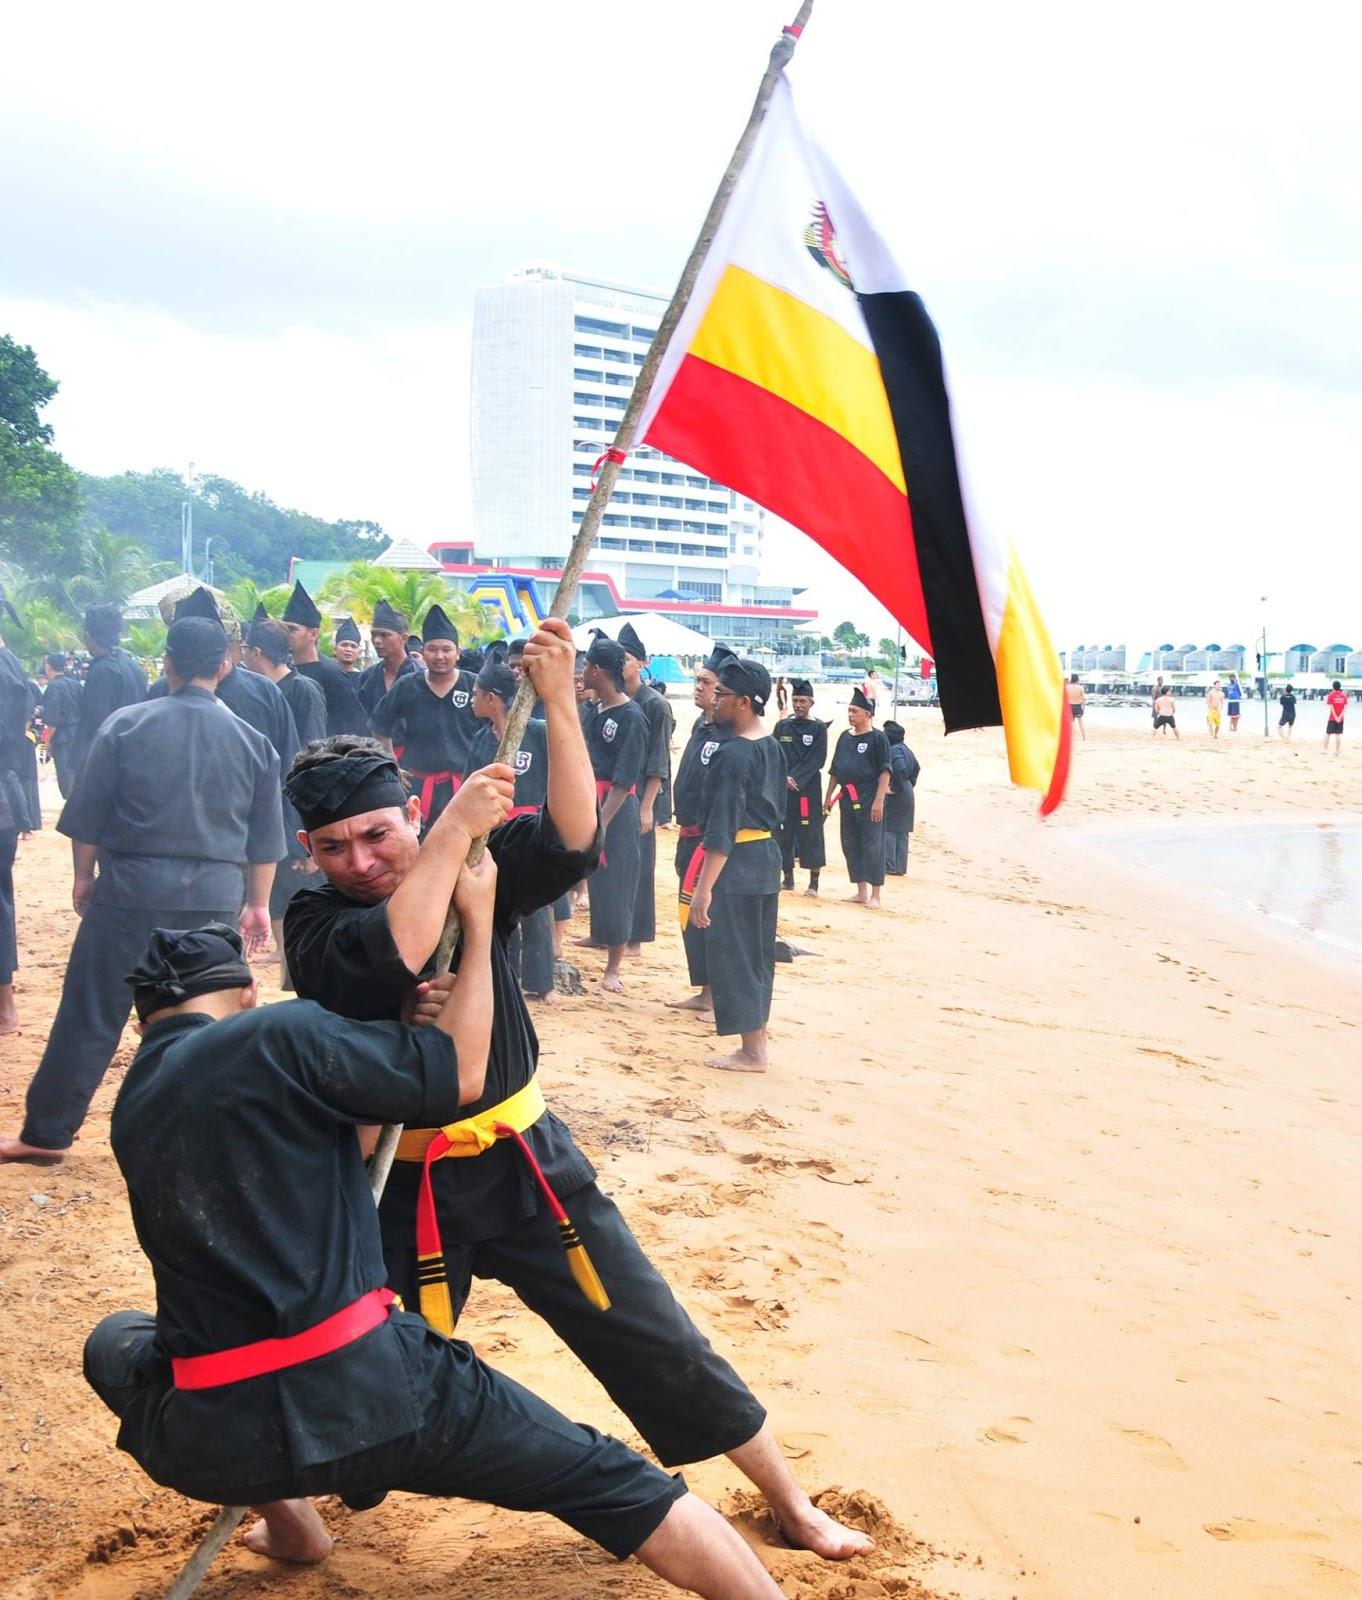 PSSGM Hulu Selangor: 54 Anak Gayong Lakar Sejarah LULUS